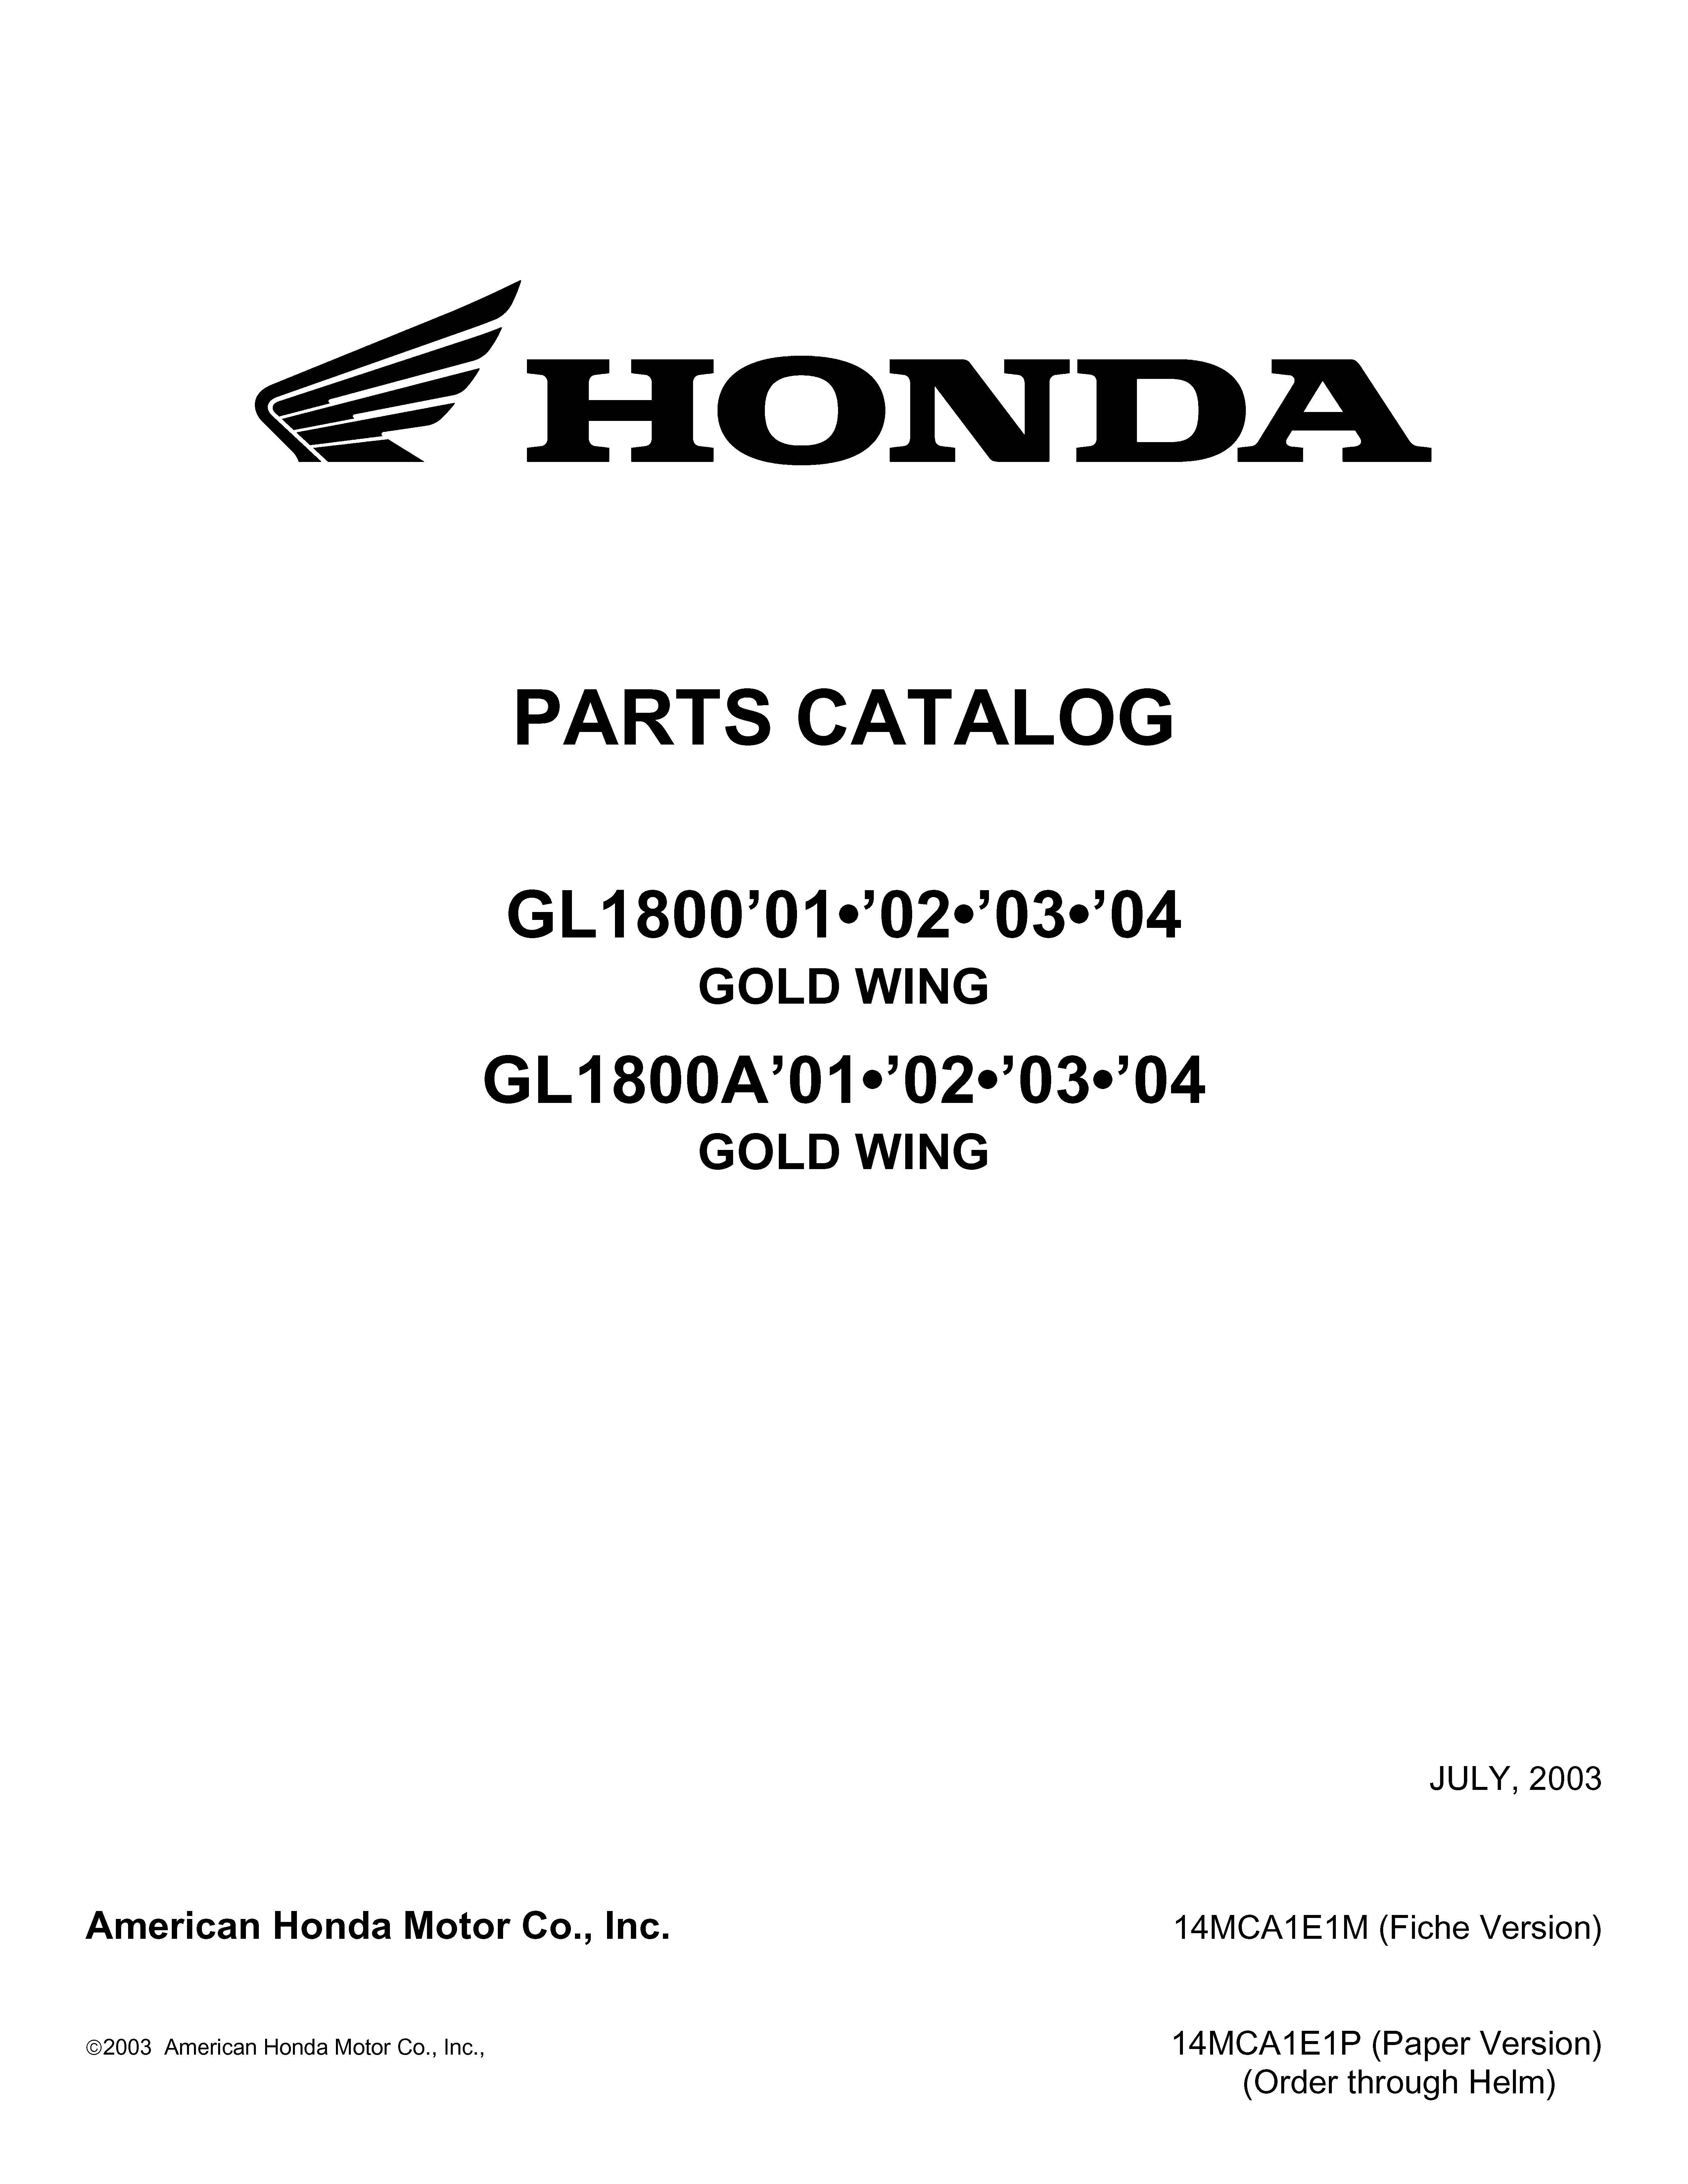 Parts list for Honda GL1800A (2001-2004)